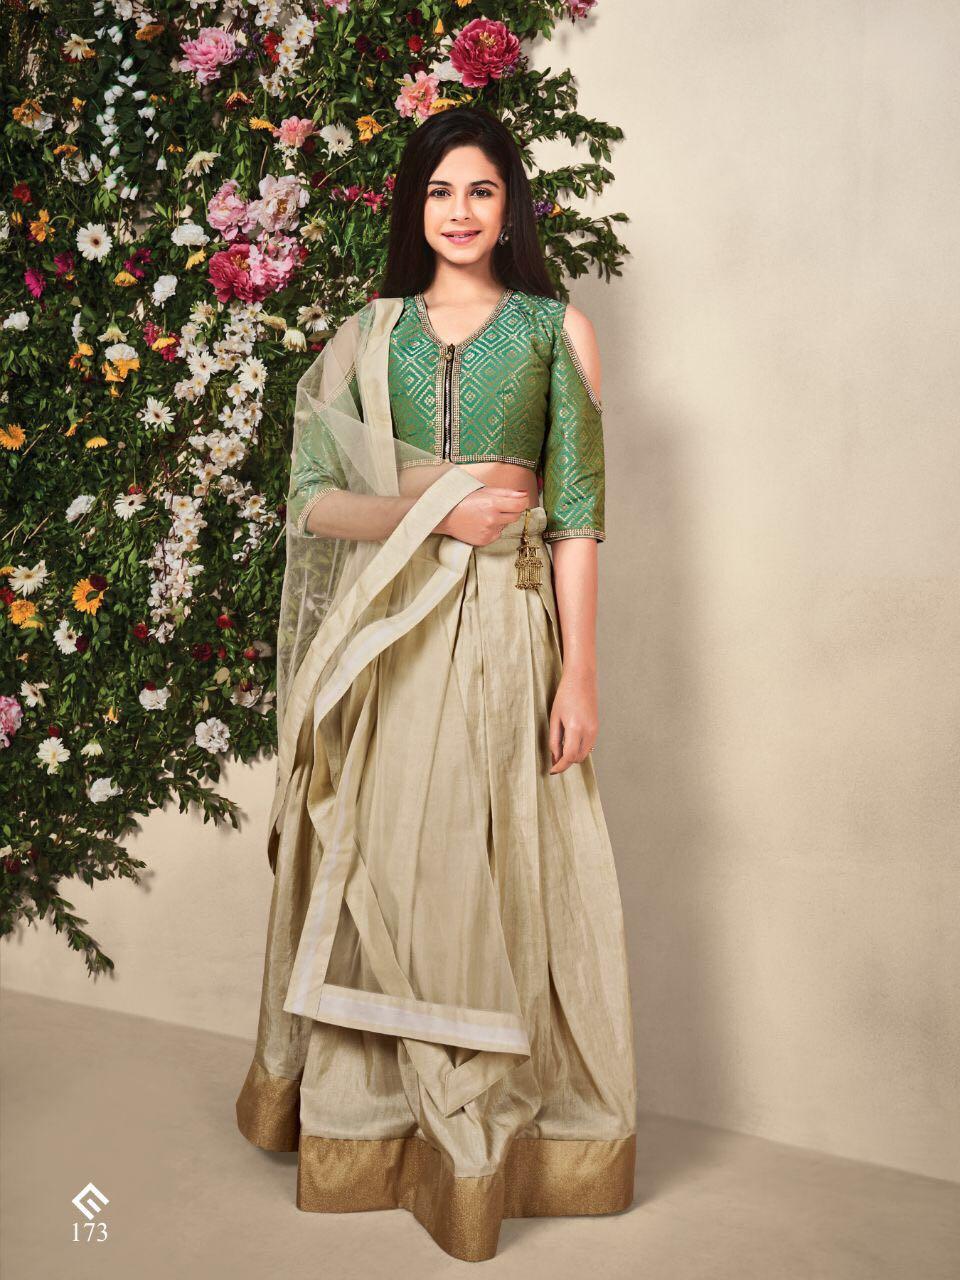 Wedding Lehenga Blouse Choli for Girl